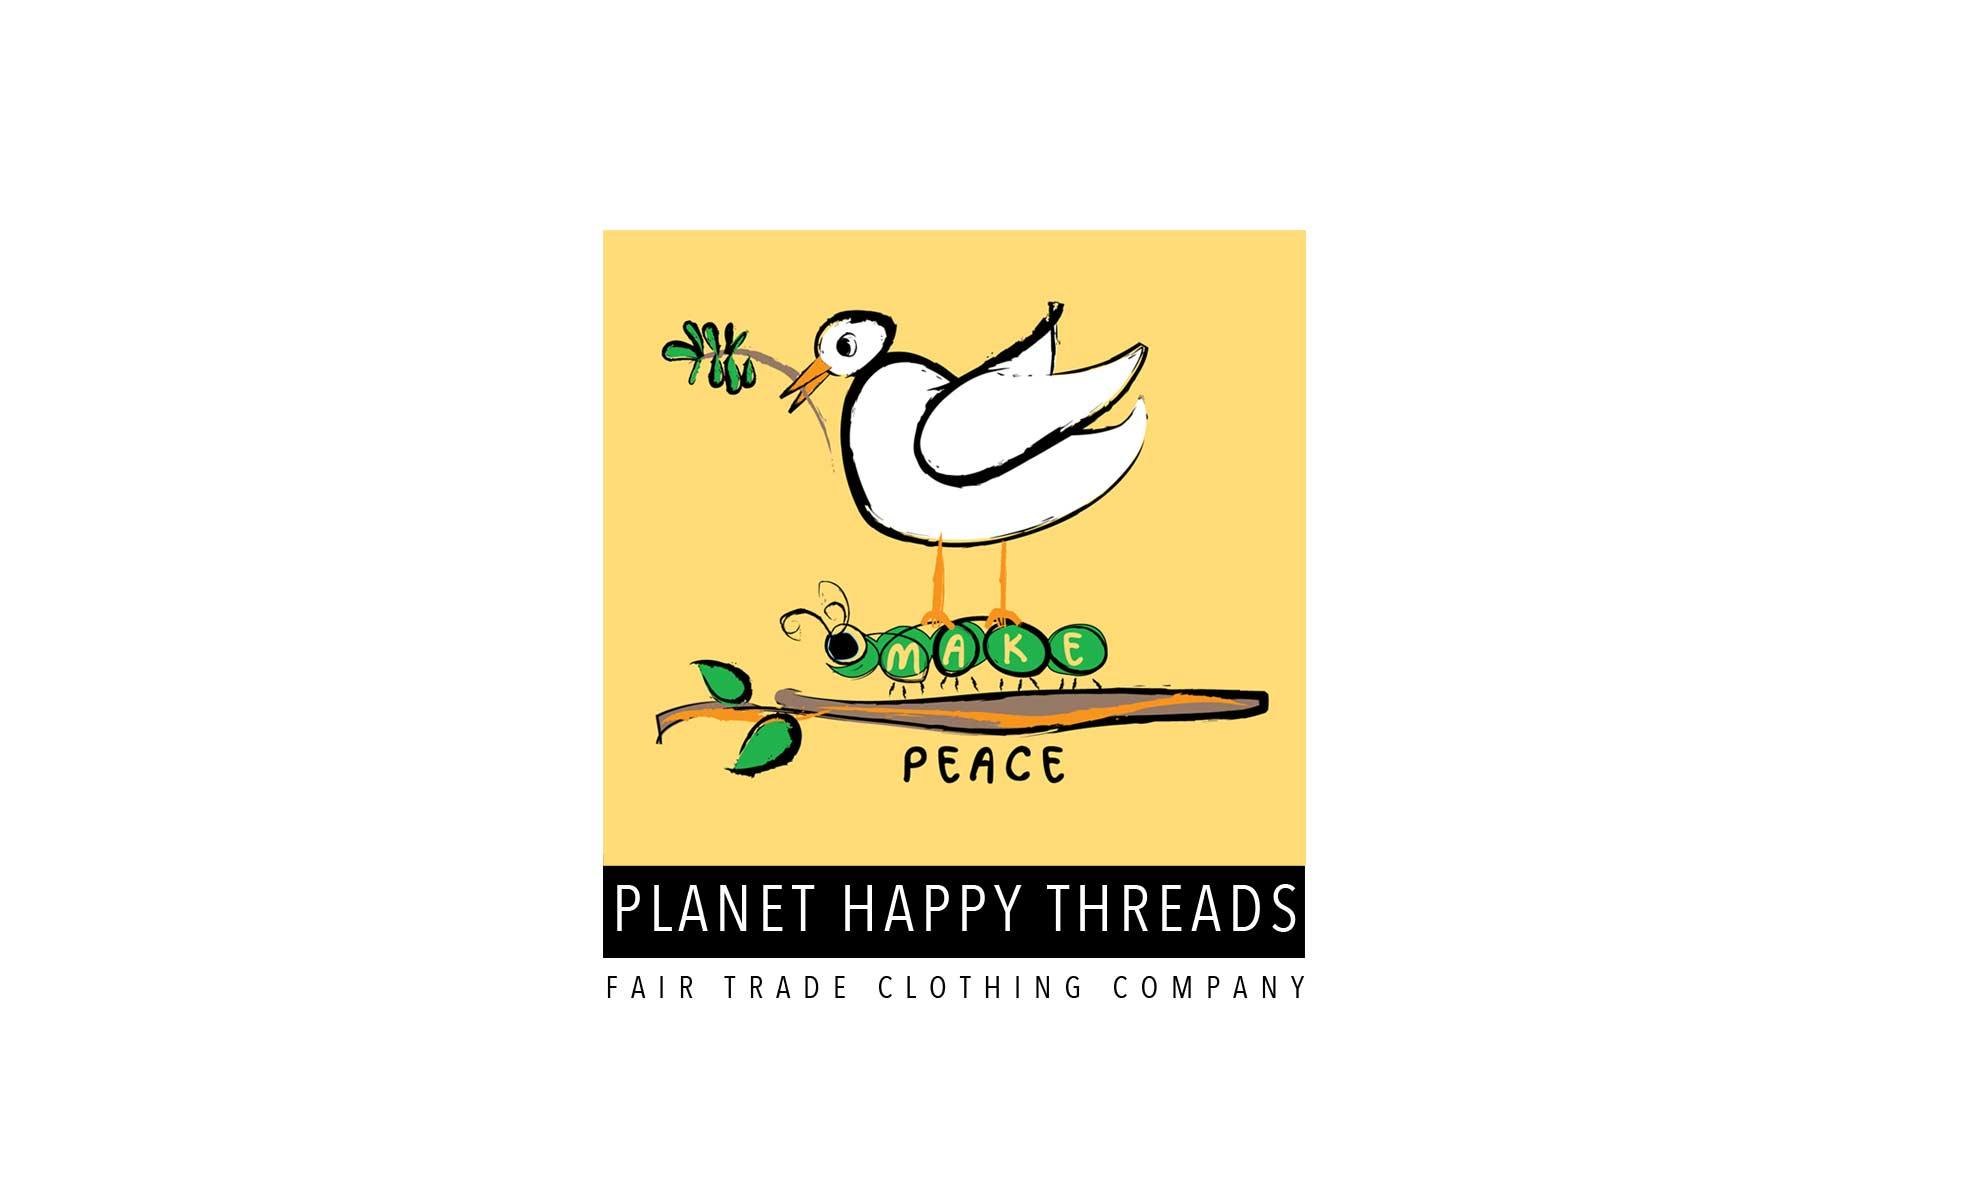 planet-happy-threads-logo-design1-web